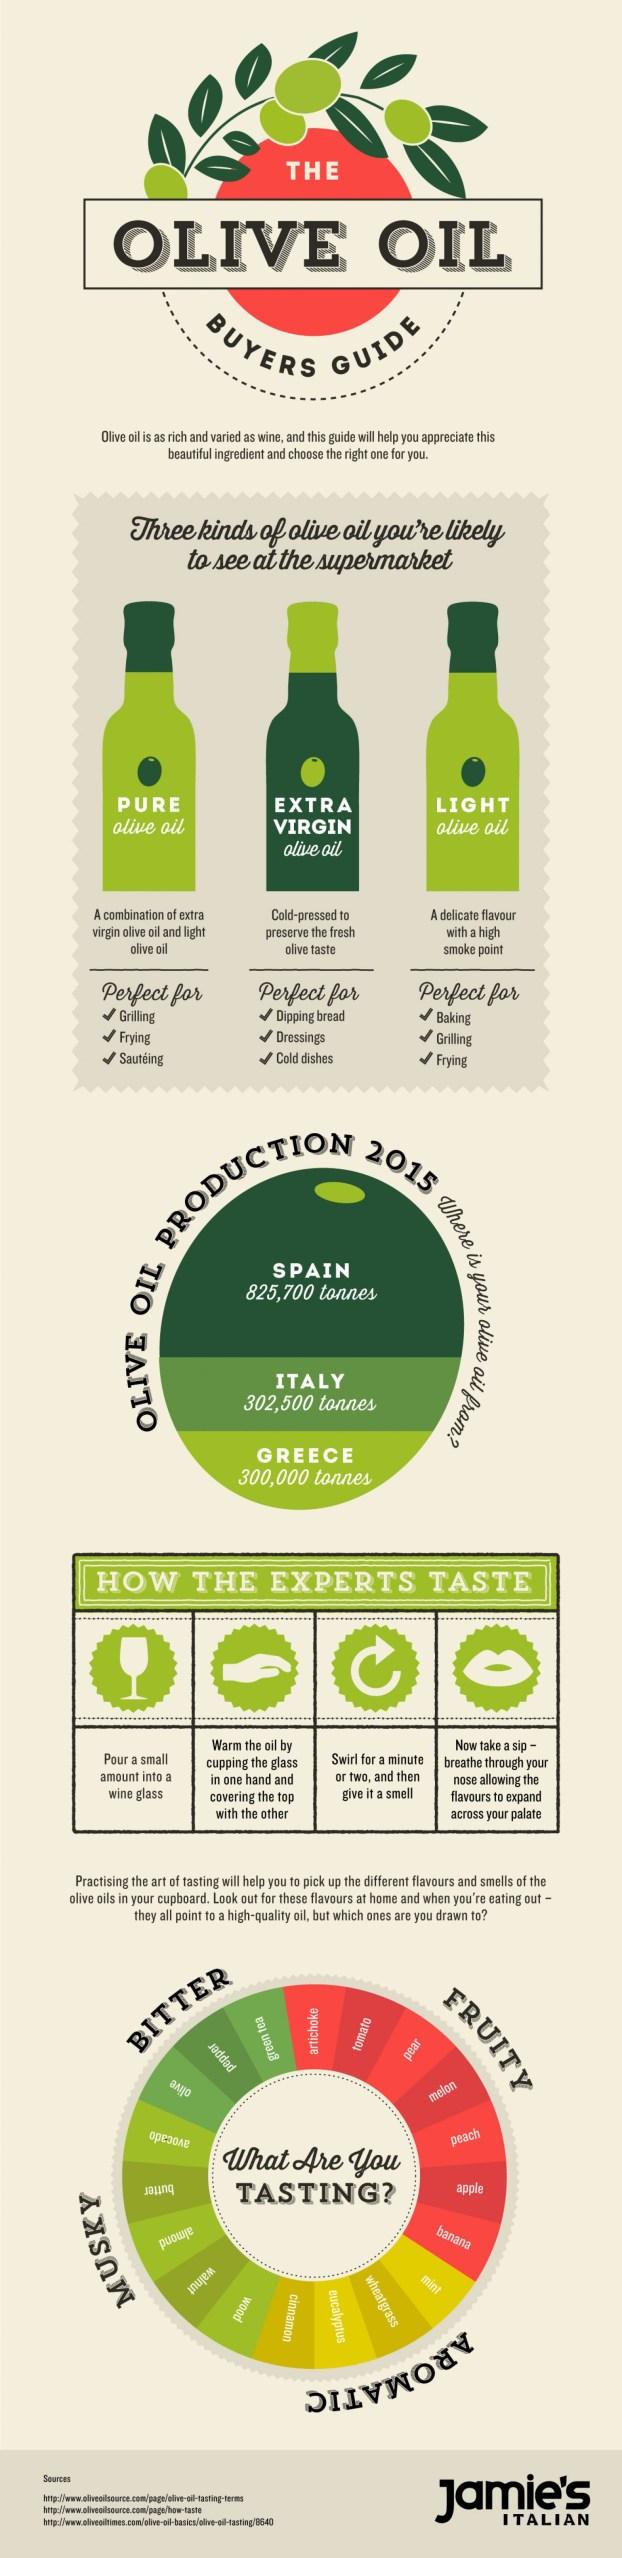 jamies-italian-olive-oil-buyers-guide_57320f2dda035_w1500